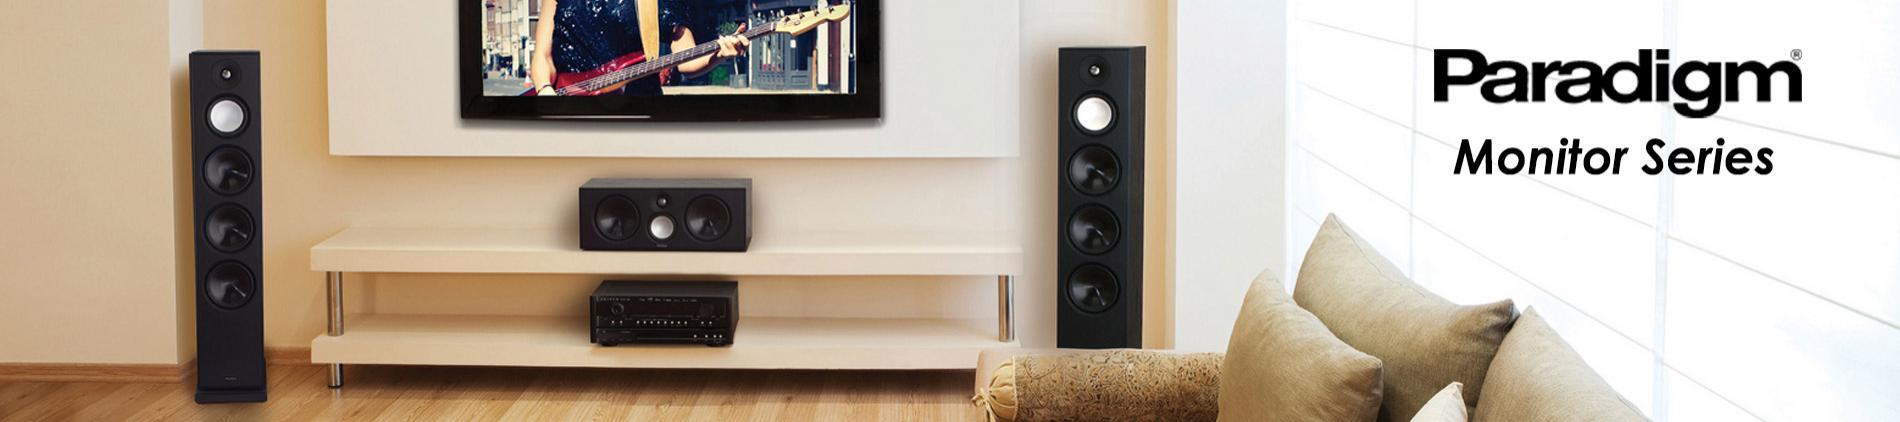 Home speaker ,home audio,tower speakers, paradigm